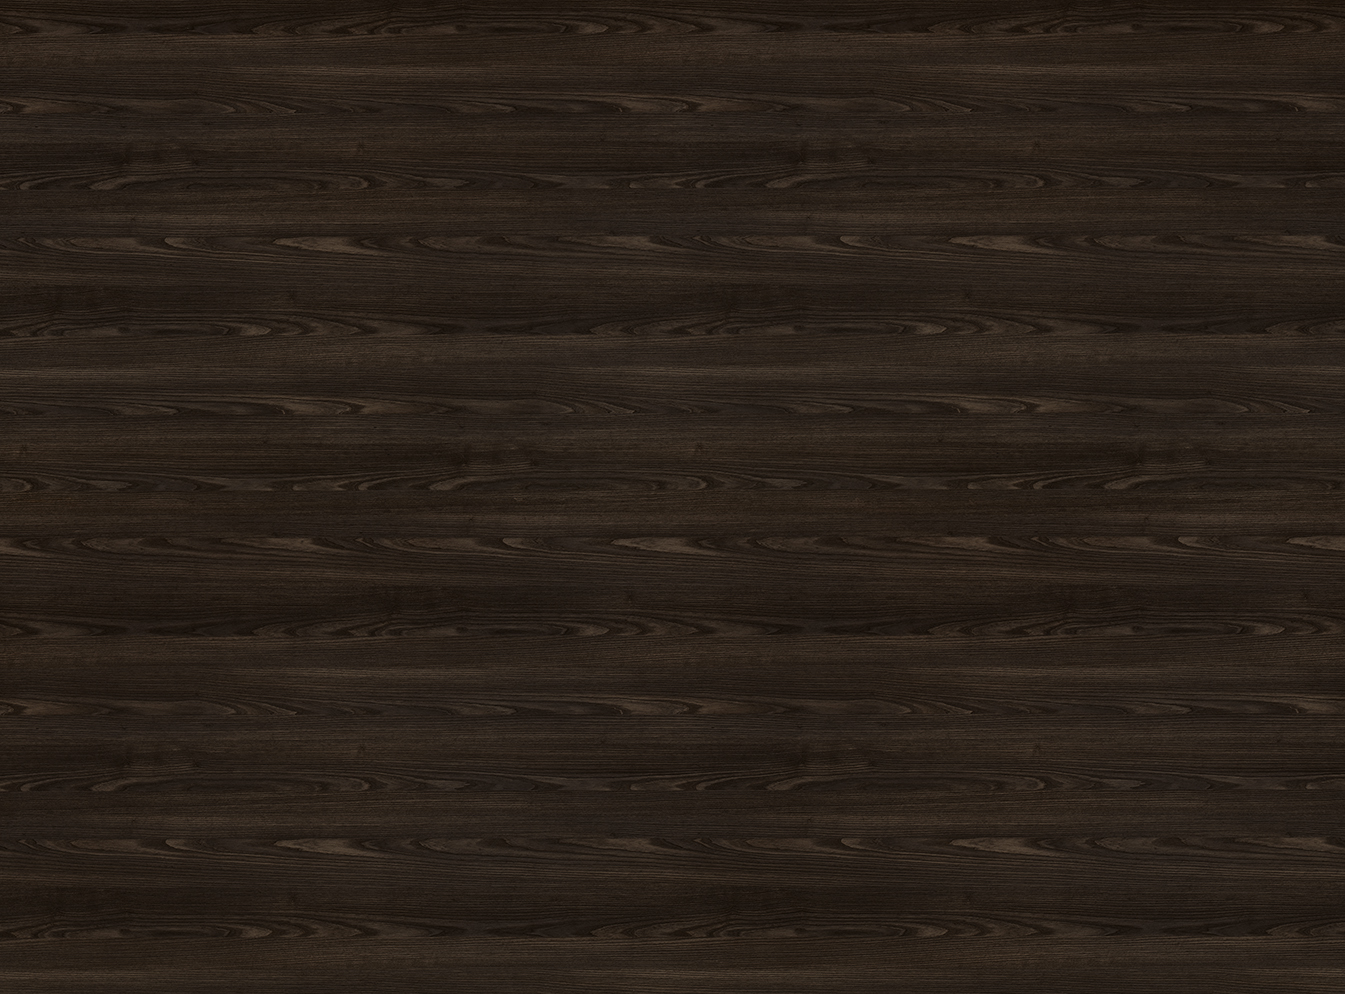 Лента AБC S141 45/1 Tivoli